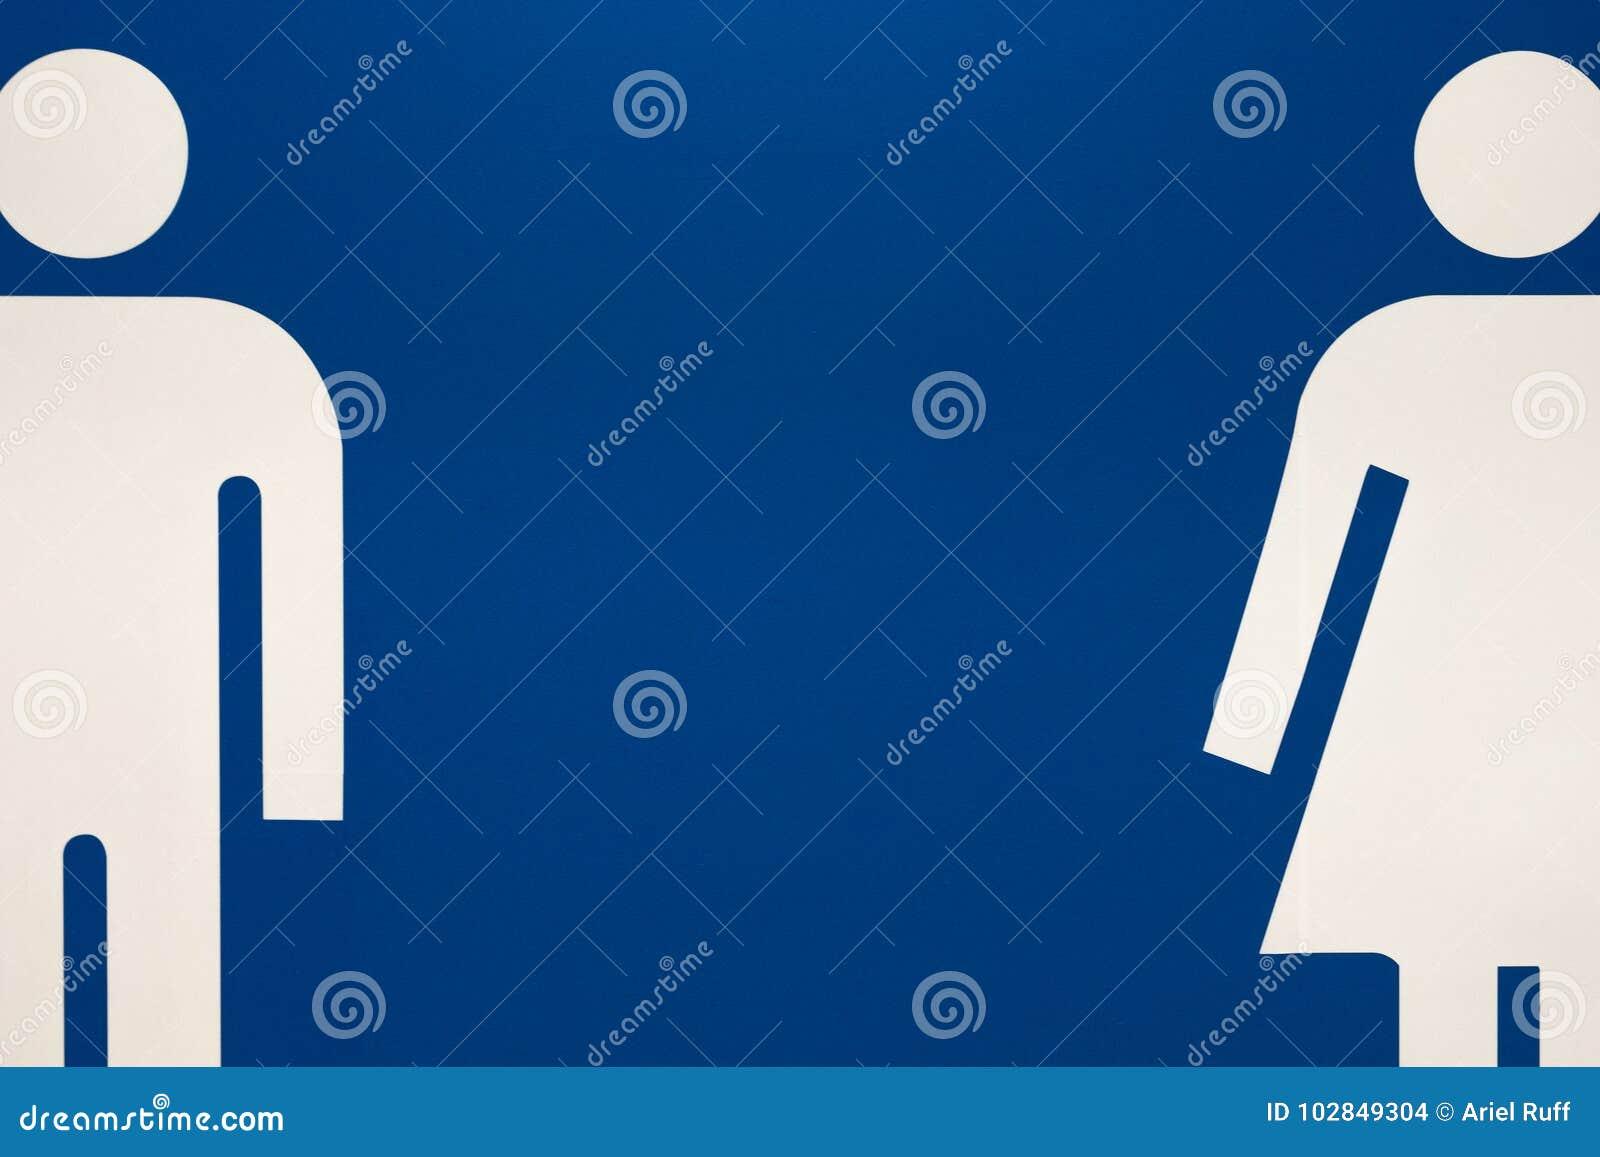 Man and woman symbols indicating designated bathrooms